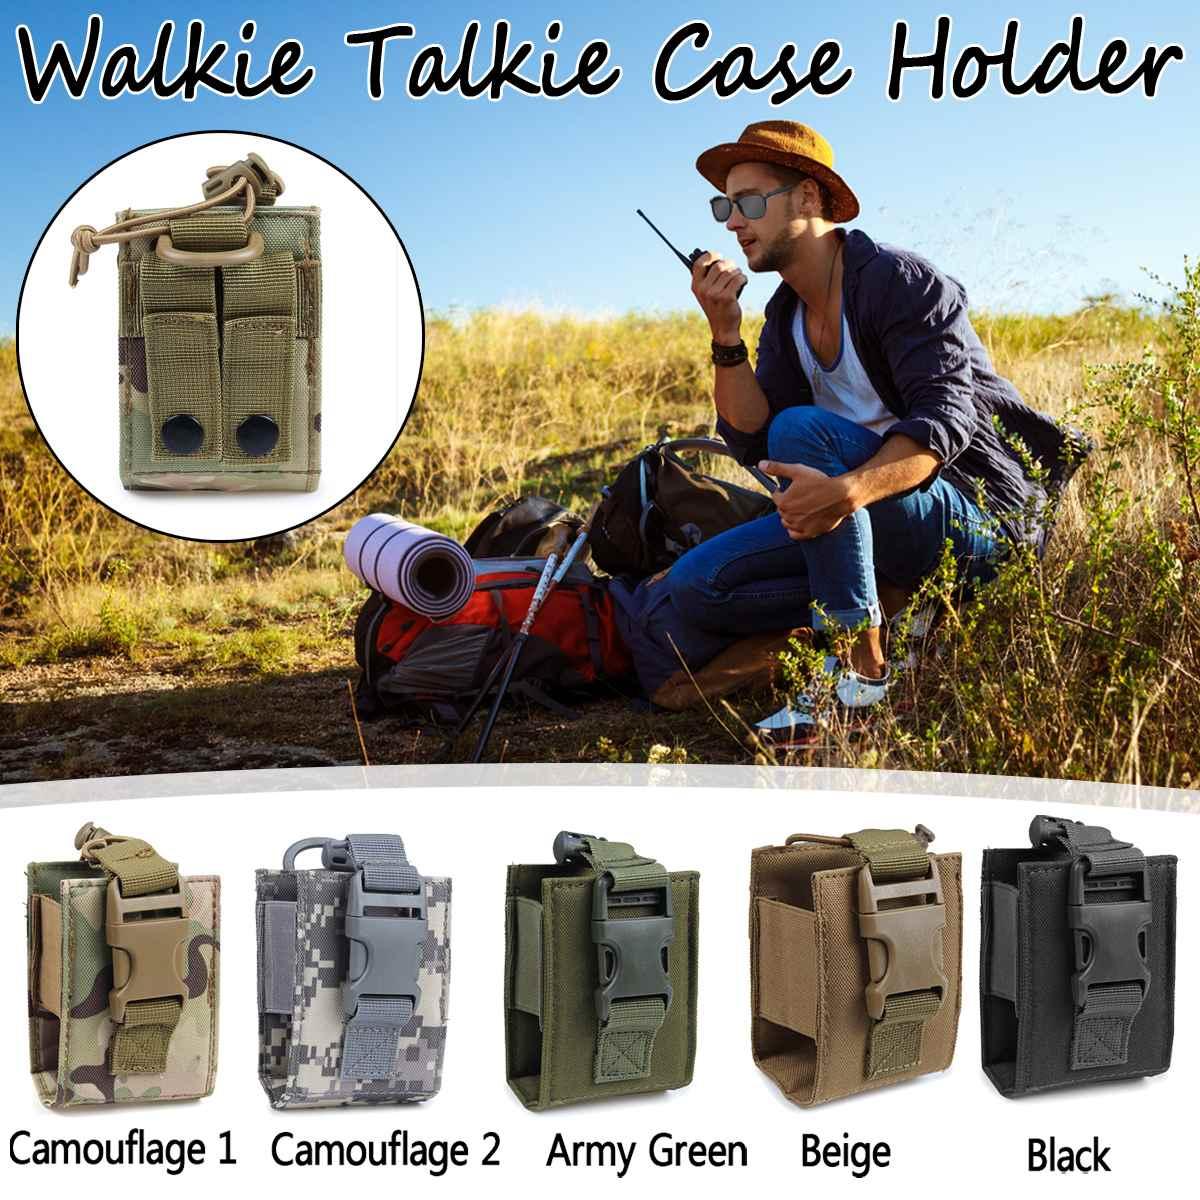 Waterproof Walkie Talkie Pouch Interphone Storage Bag Waist Bag Outdoor Pouch Case Holder For Walkie Talkie